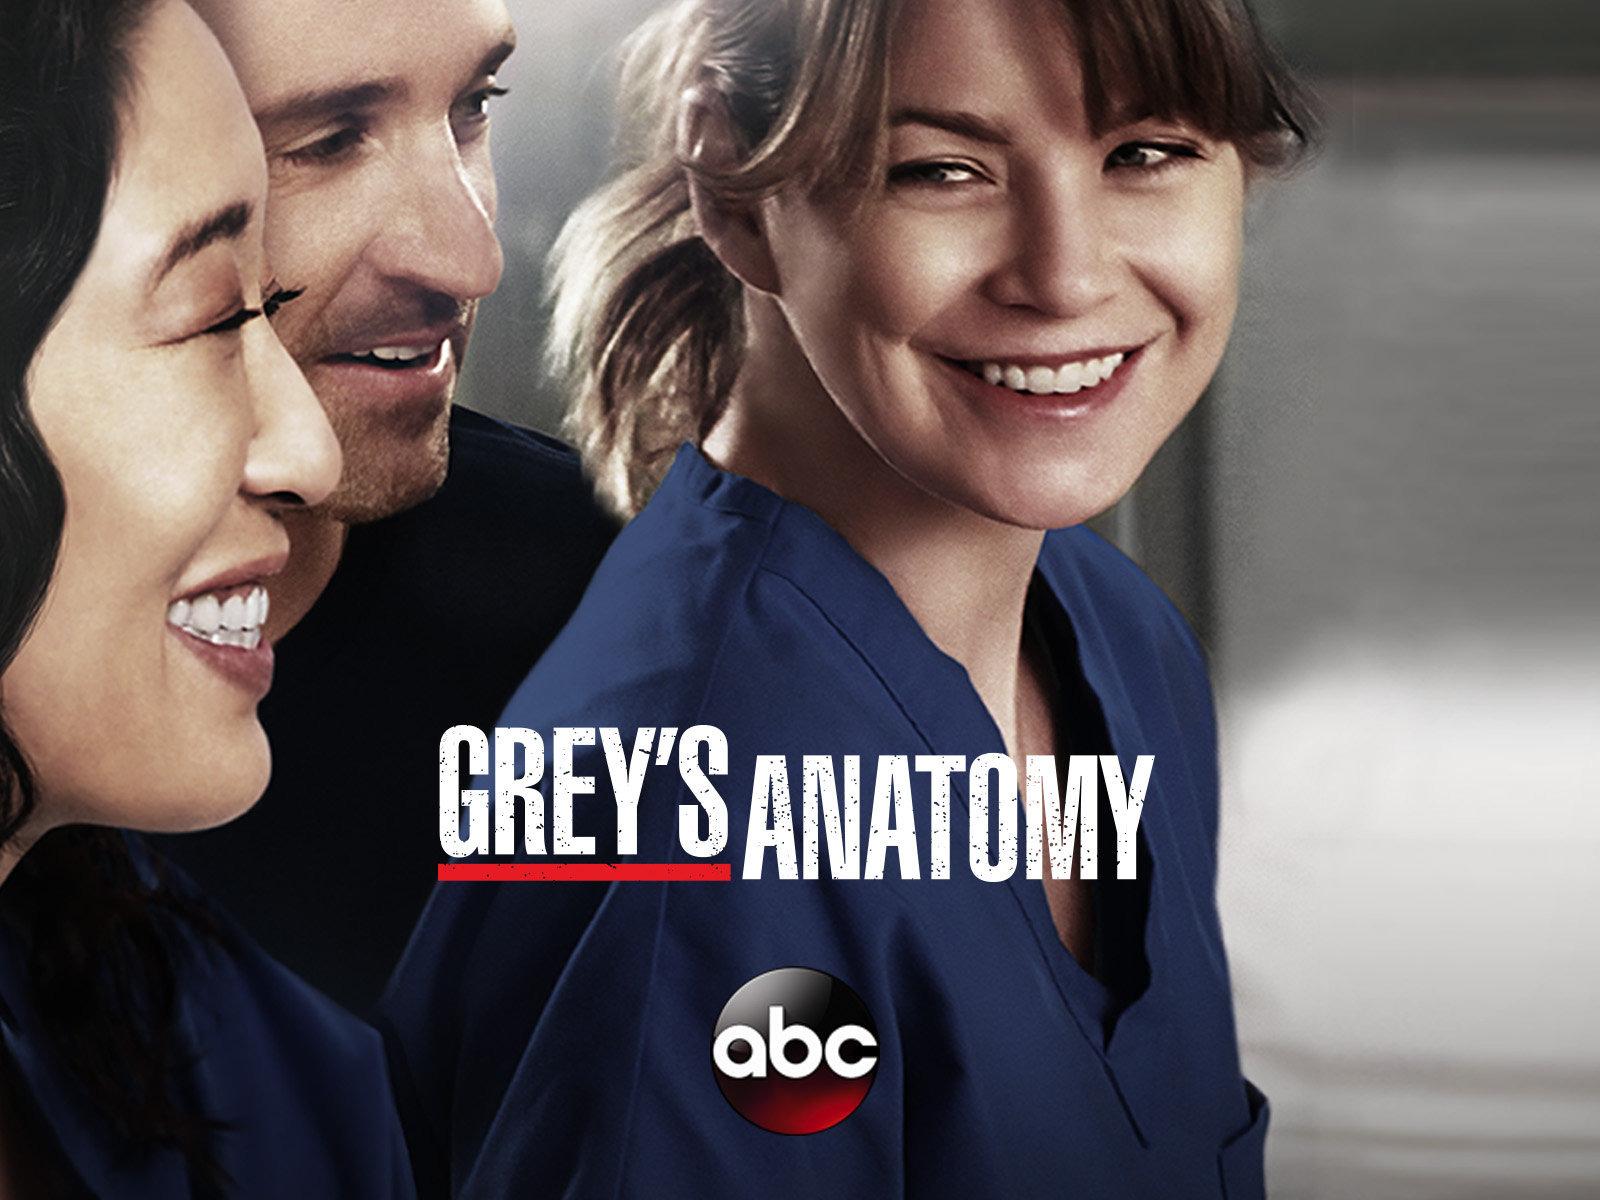 Amazon.de: Greys Anatomy Season 17 [dt./OV] ansehen